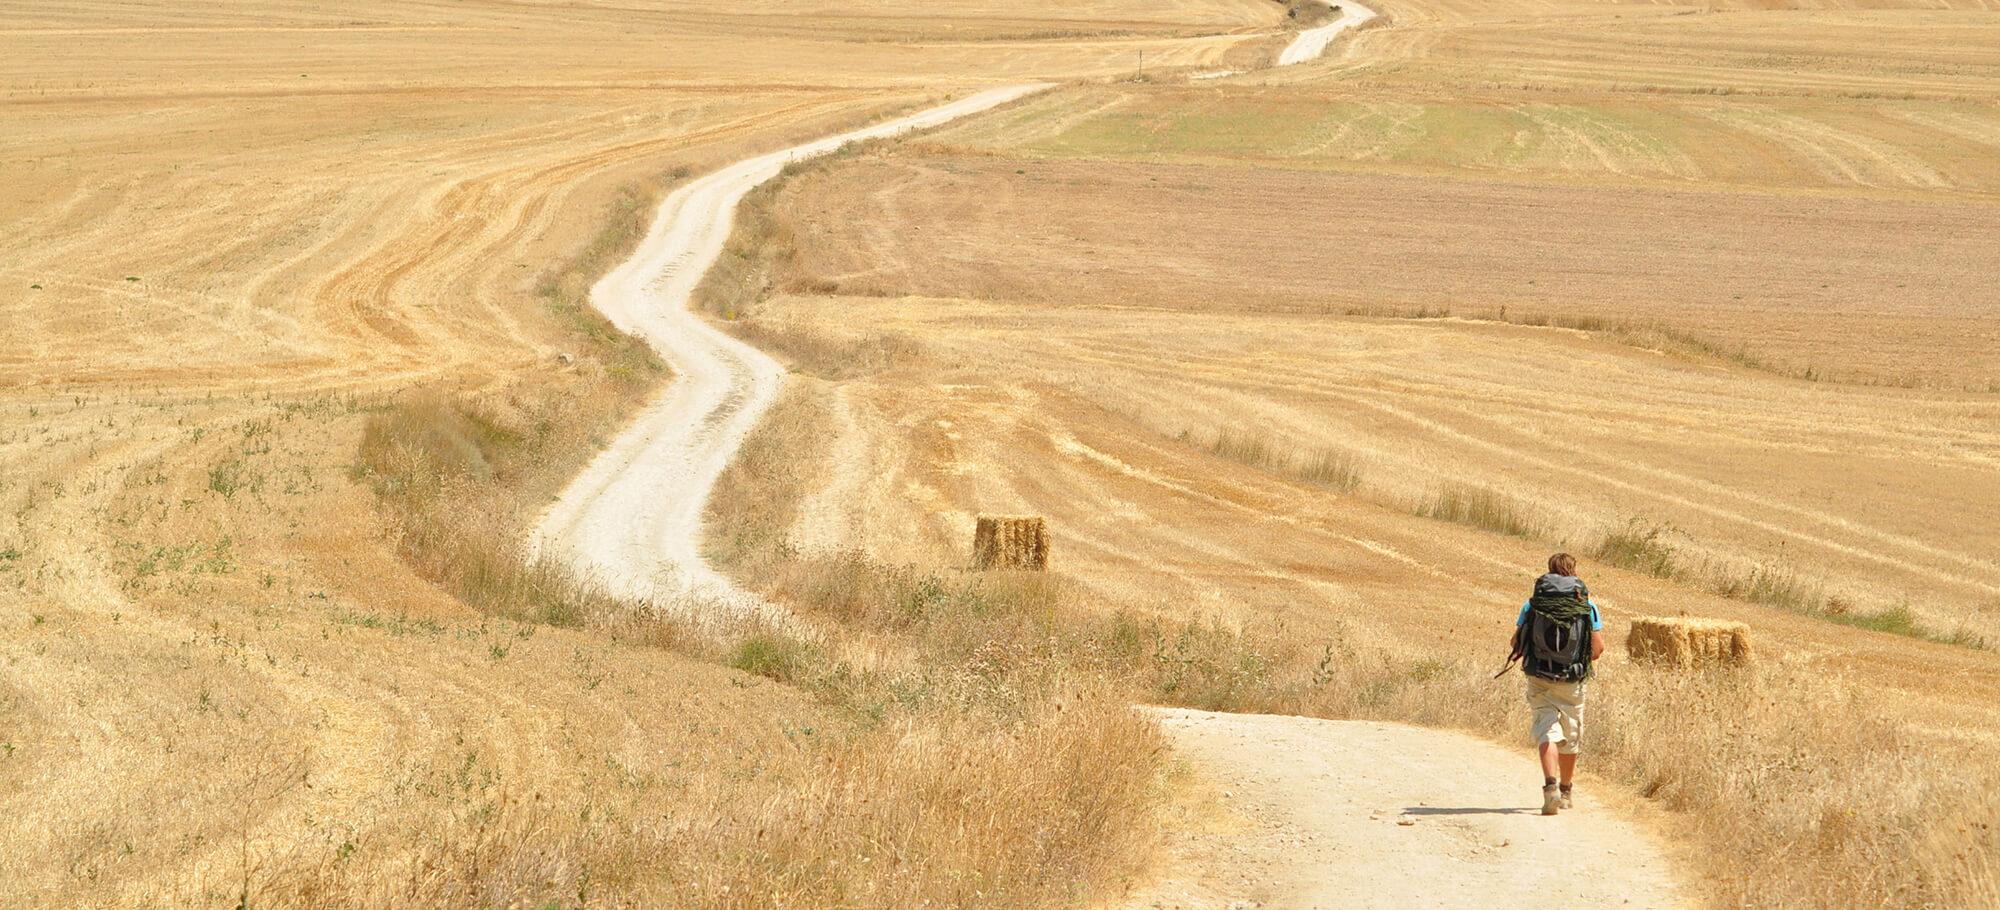 Wanderer folgt dem Jakobsweg durch spätsommerliche Felder